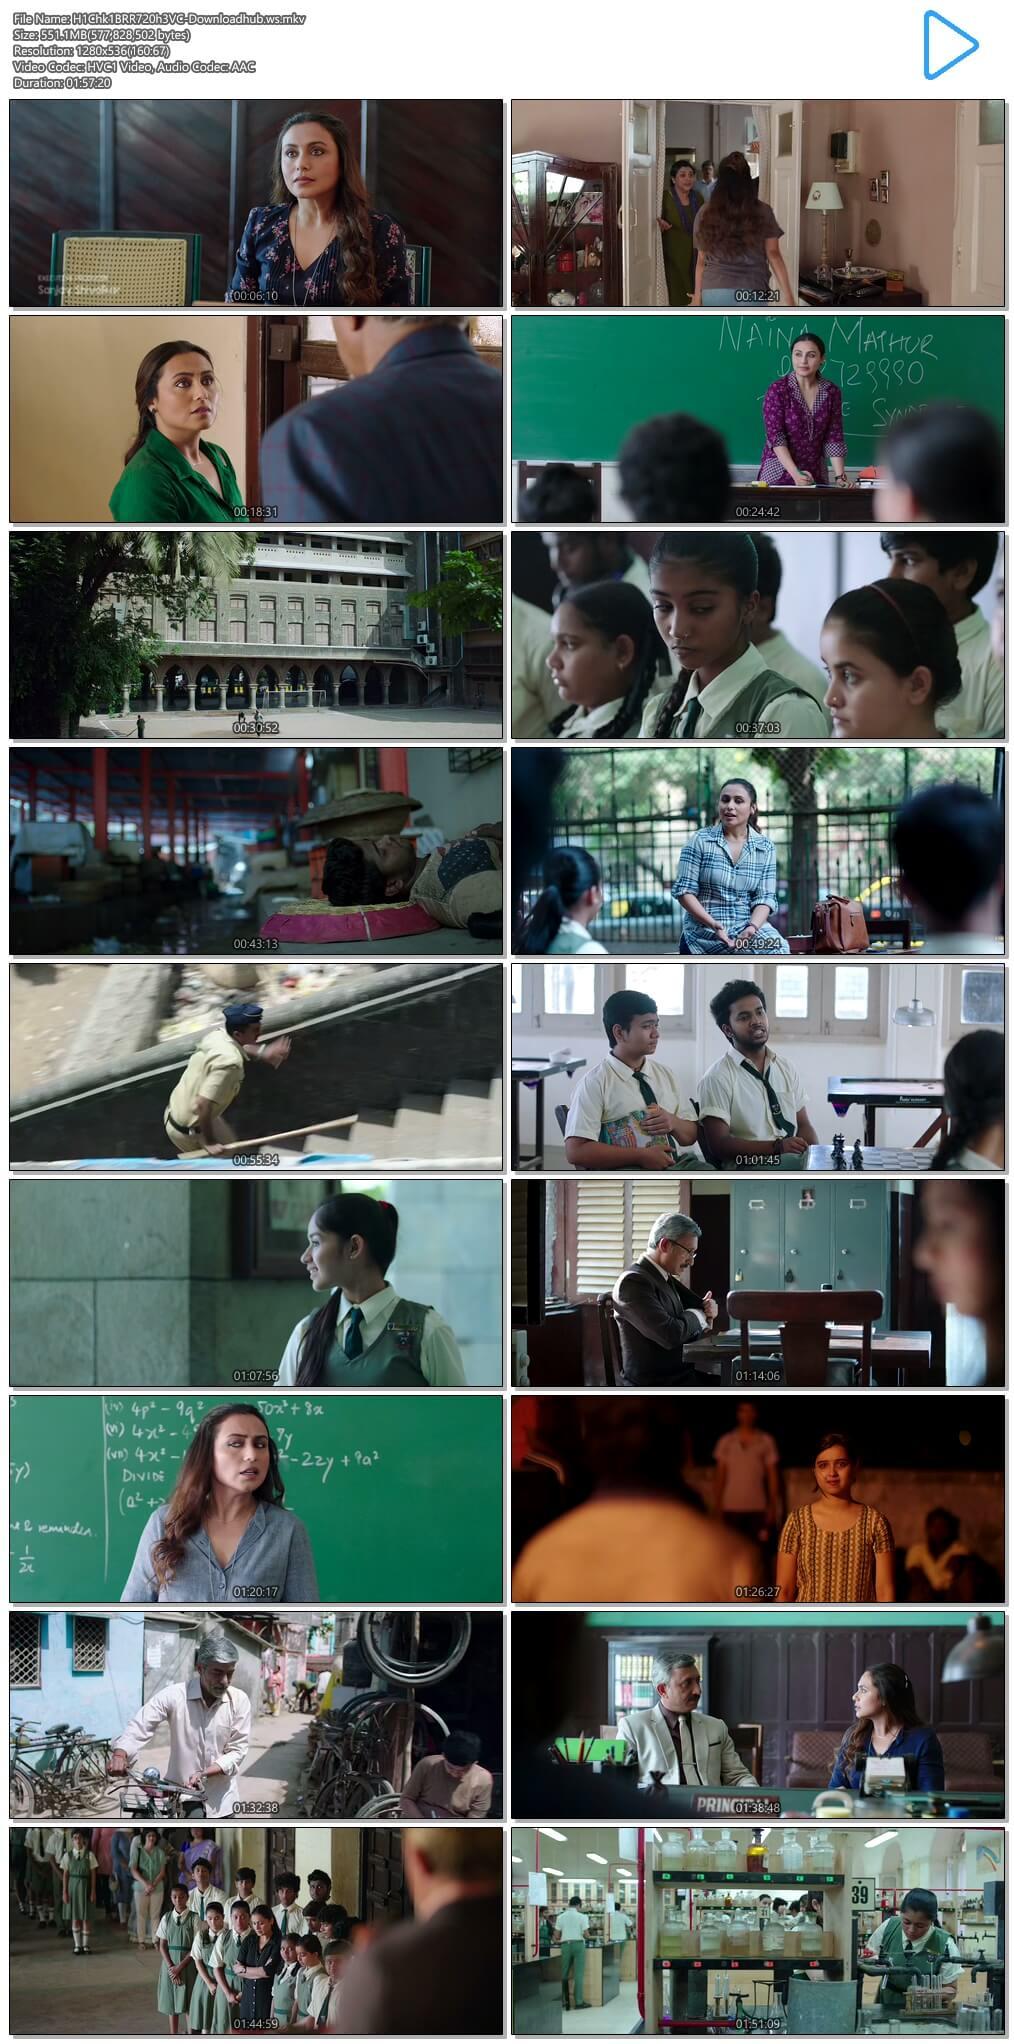 Hichki 2018 Hindi 720p HEVC BluRay ESubs